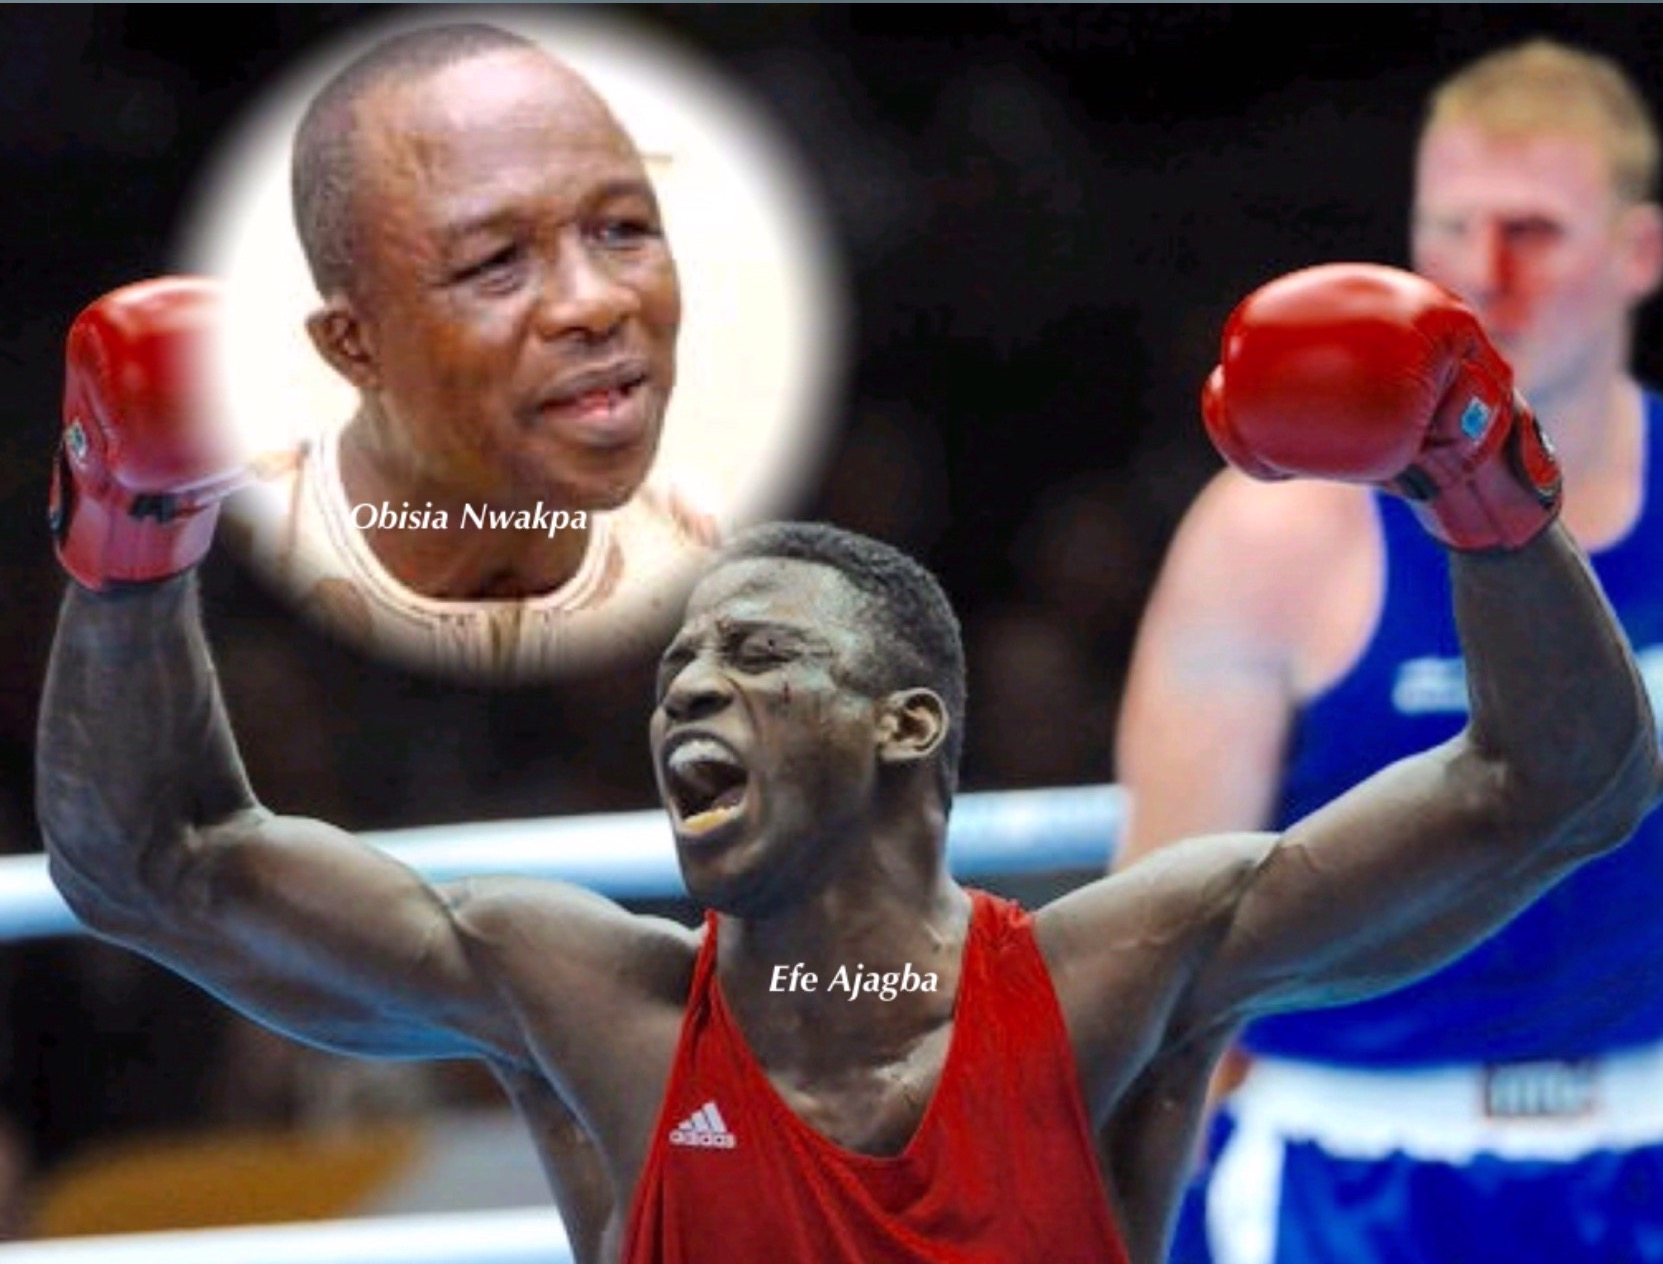 2016 Olympics: Nwakpa, Olalehin Disagree On Nigeria's Boxing Medals Chances